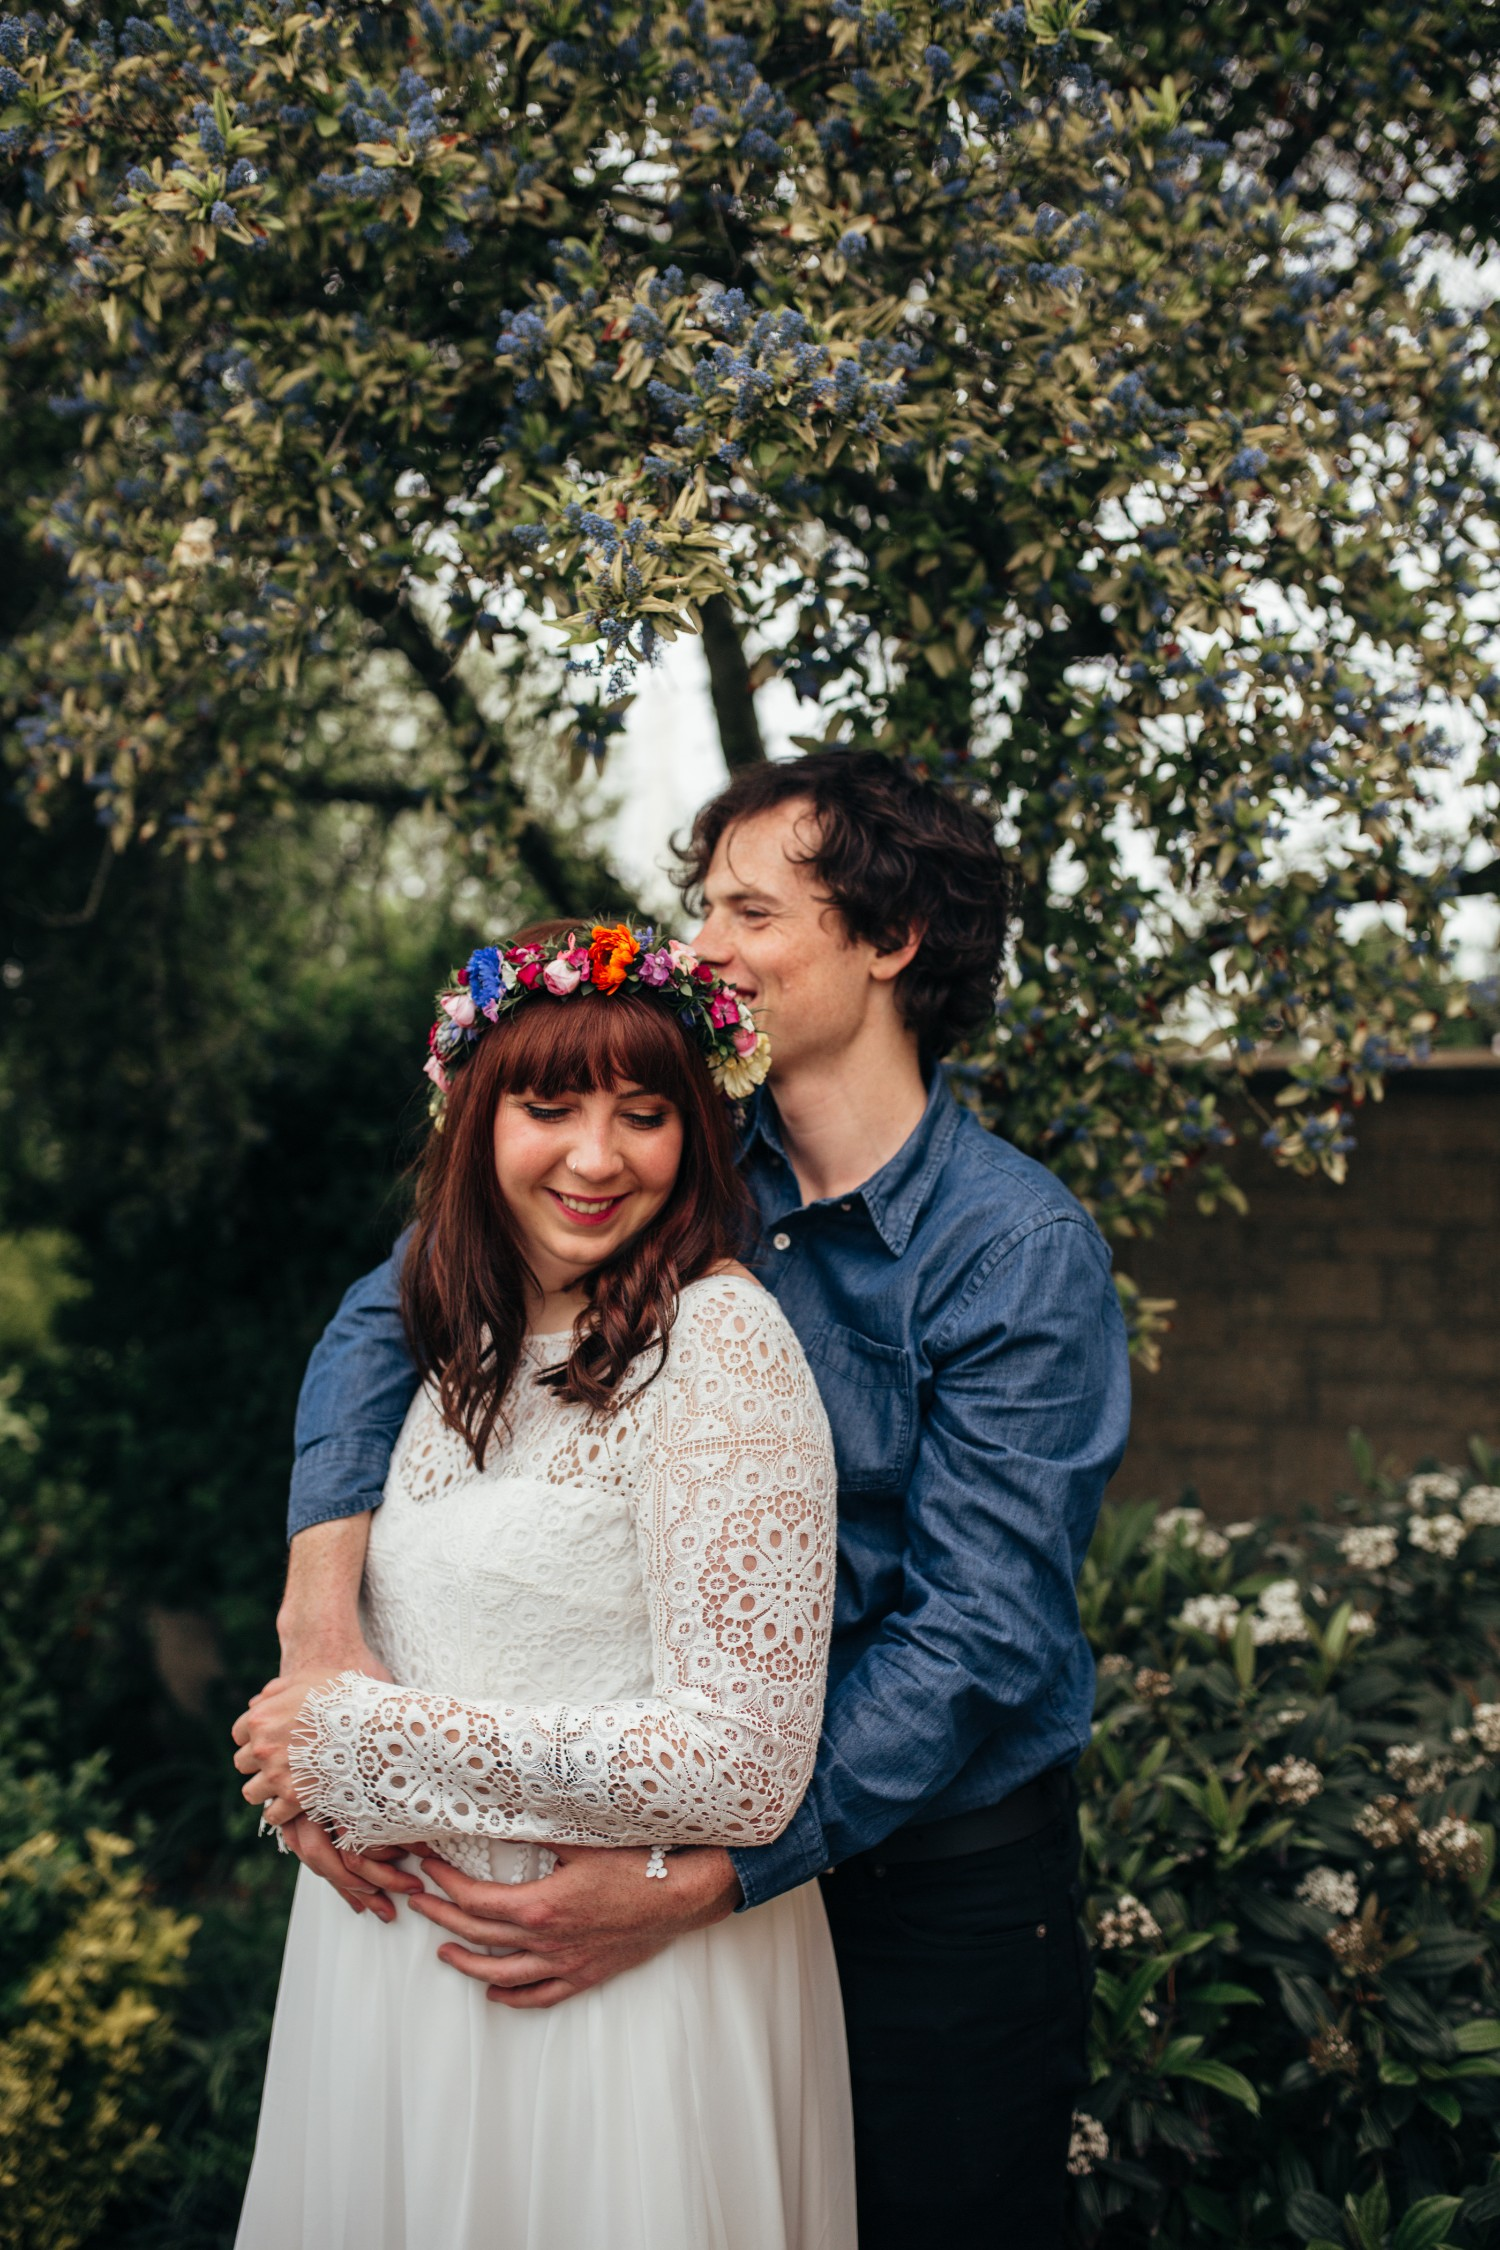 Lizzy + Jack RocknRoll Festival Wedding NaomiJanePhotography-592.jpg